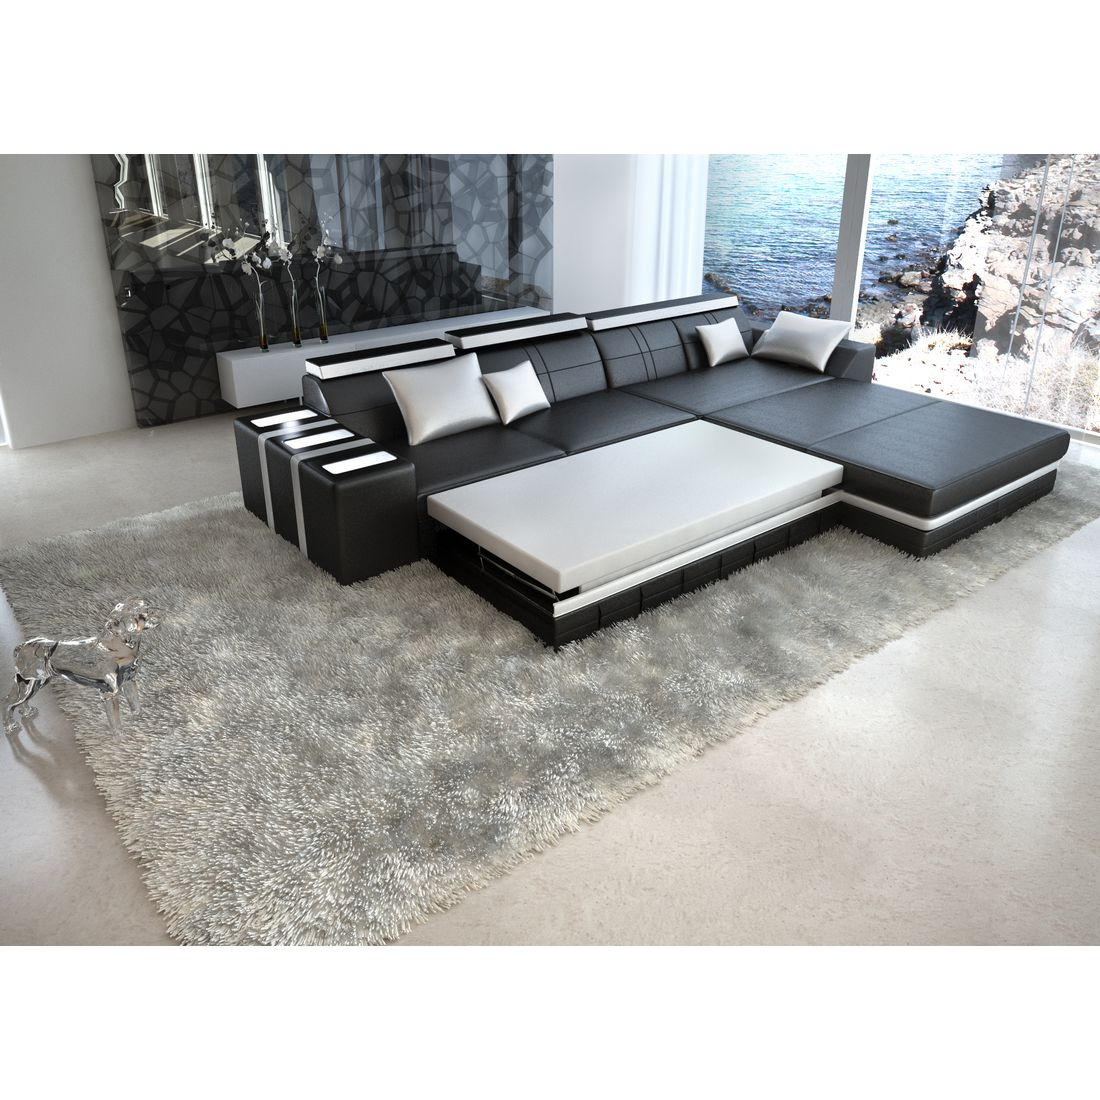 wohnlandschaft asti echtleder l form schwarz wei ausf hrung ottomane rechts sofa dreams. Black Bedroom Furniture Sets. Home Design Ideas